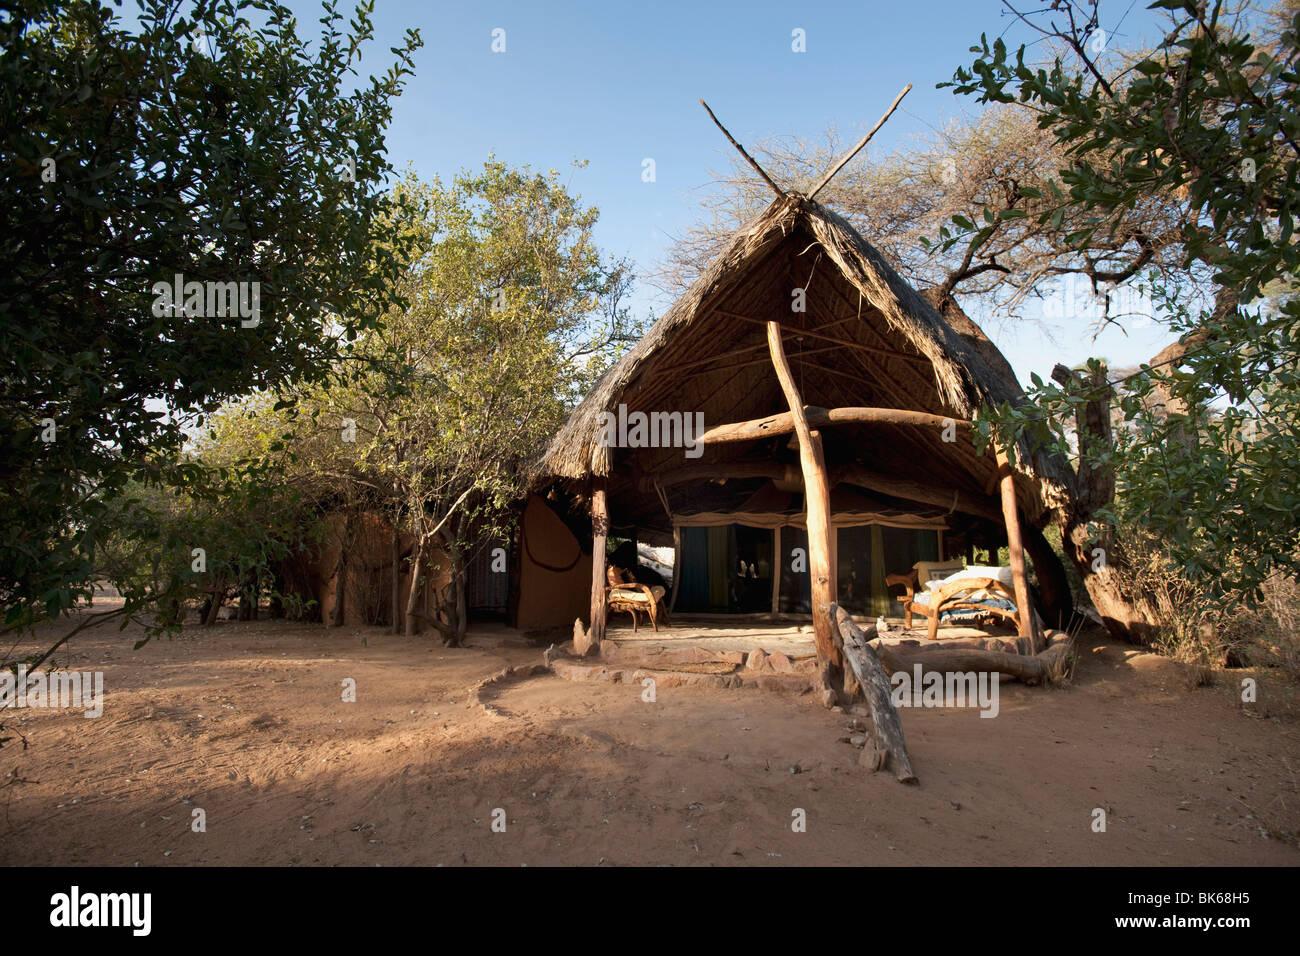 Elephant Watch Camp, Samburu National Reserve, Kenya, Africa - Stock Image